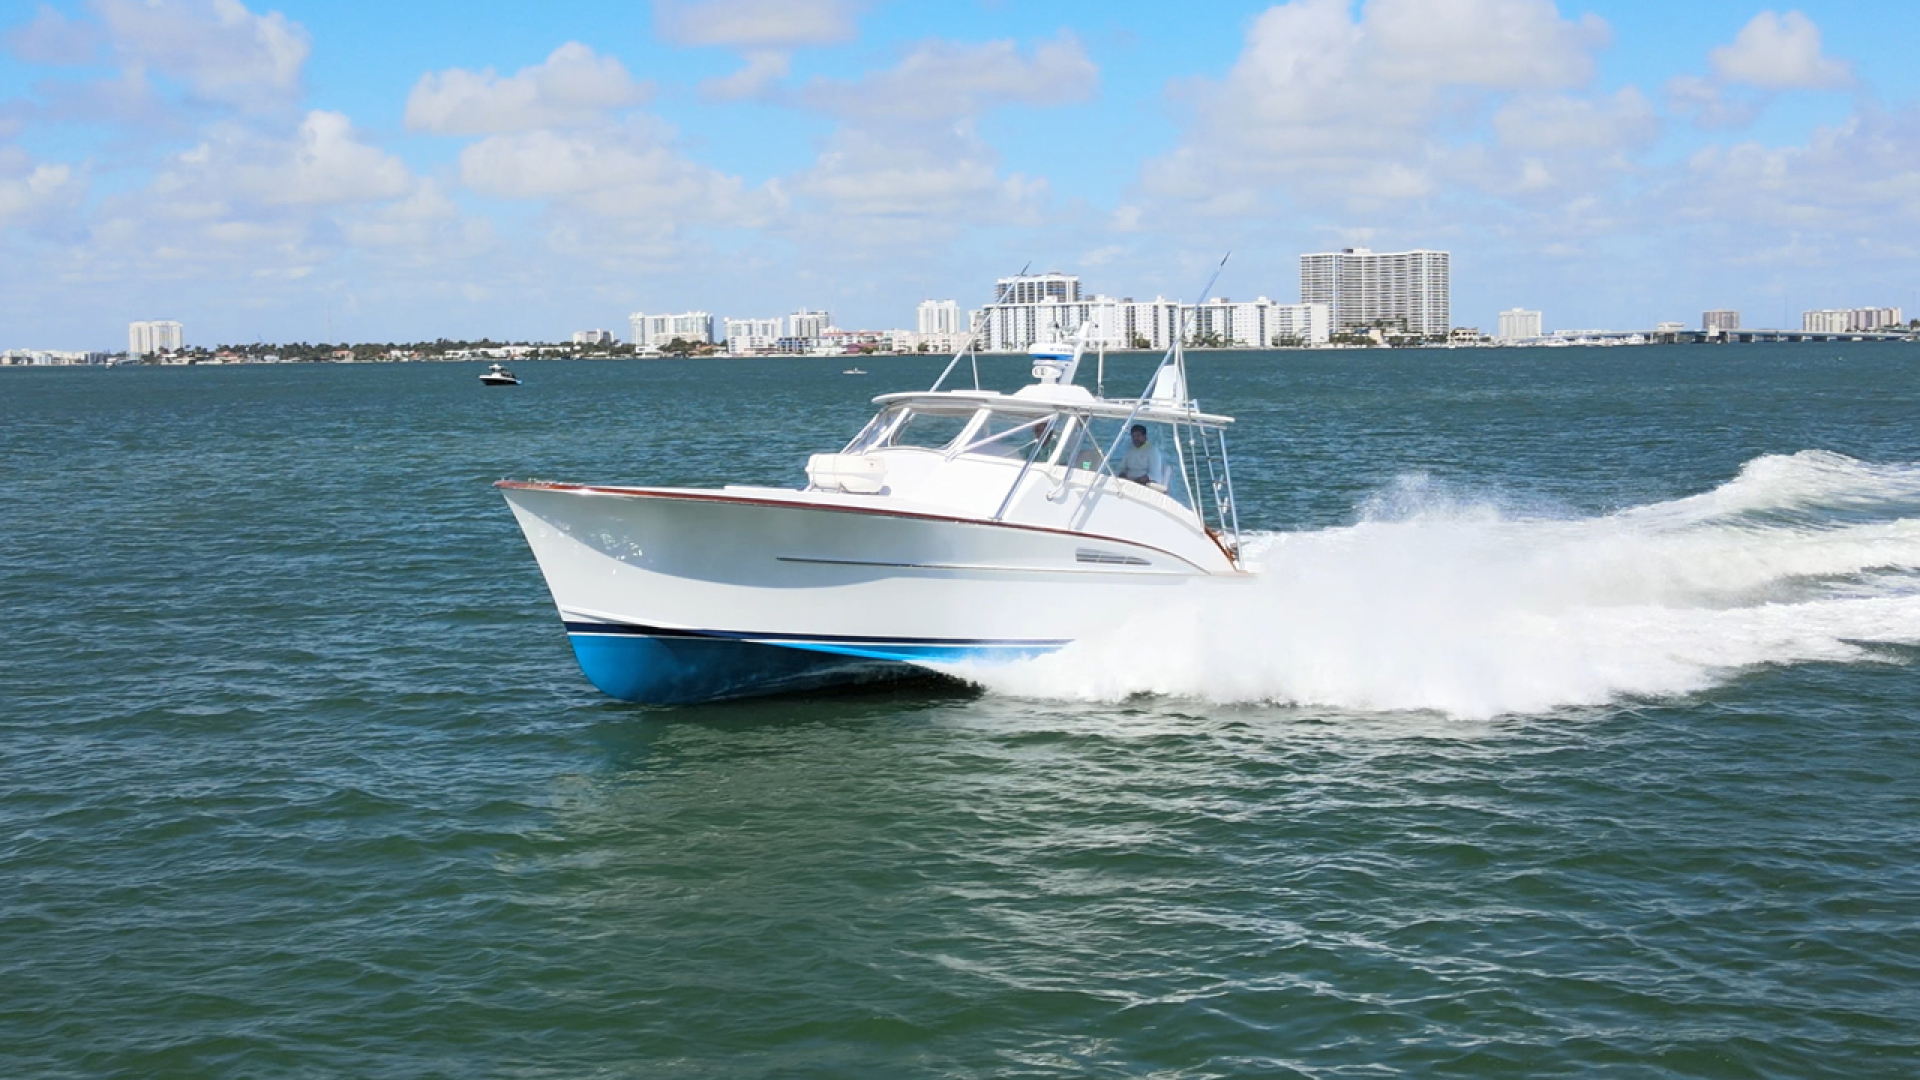 Rybovich-Sportfish Express 1990-Boots Miami Beach-Florida-United States-1625468 | Thumbnail